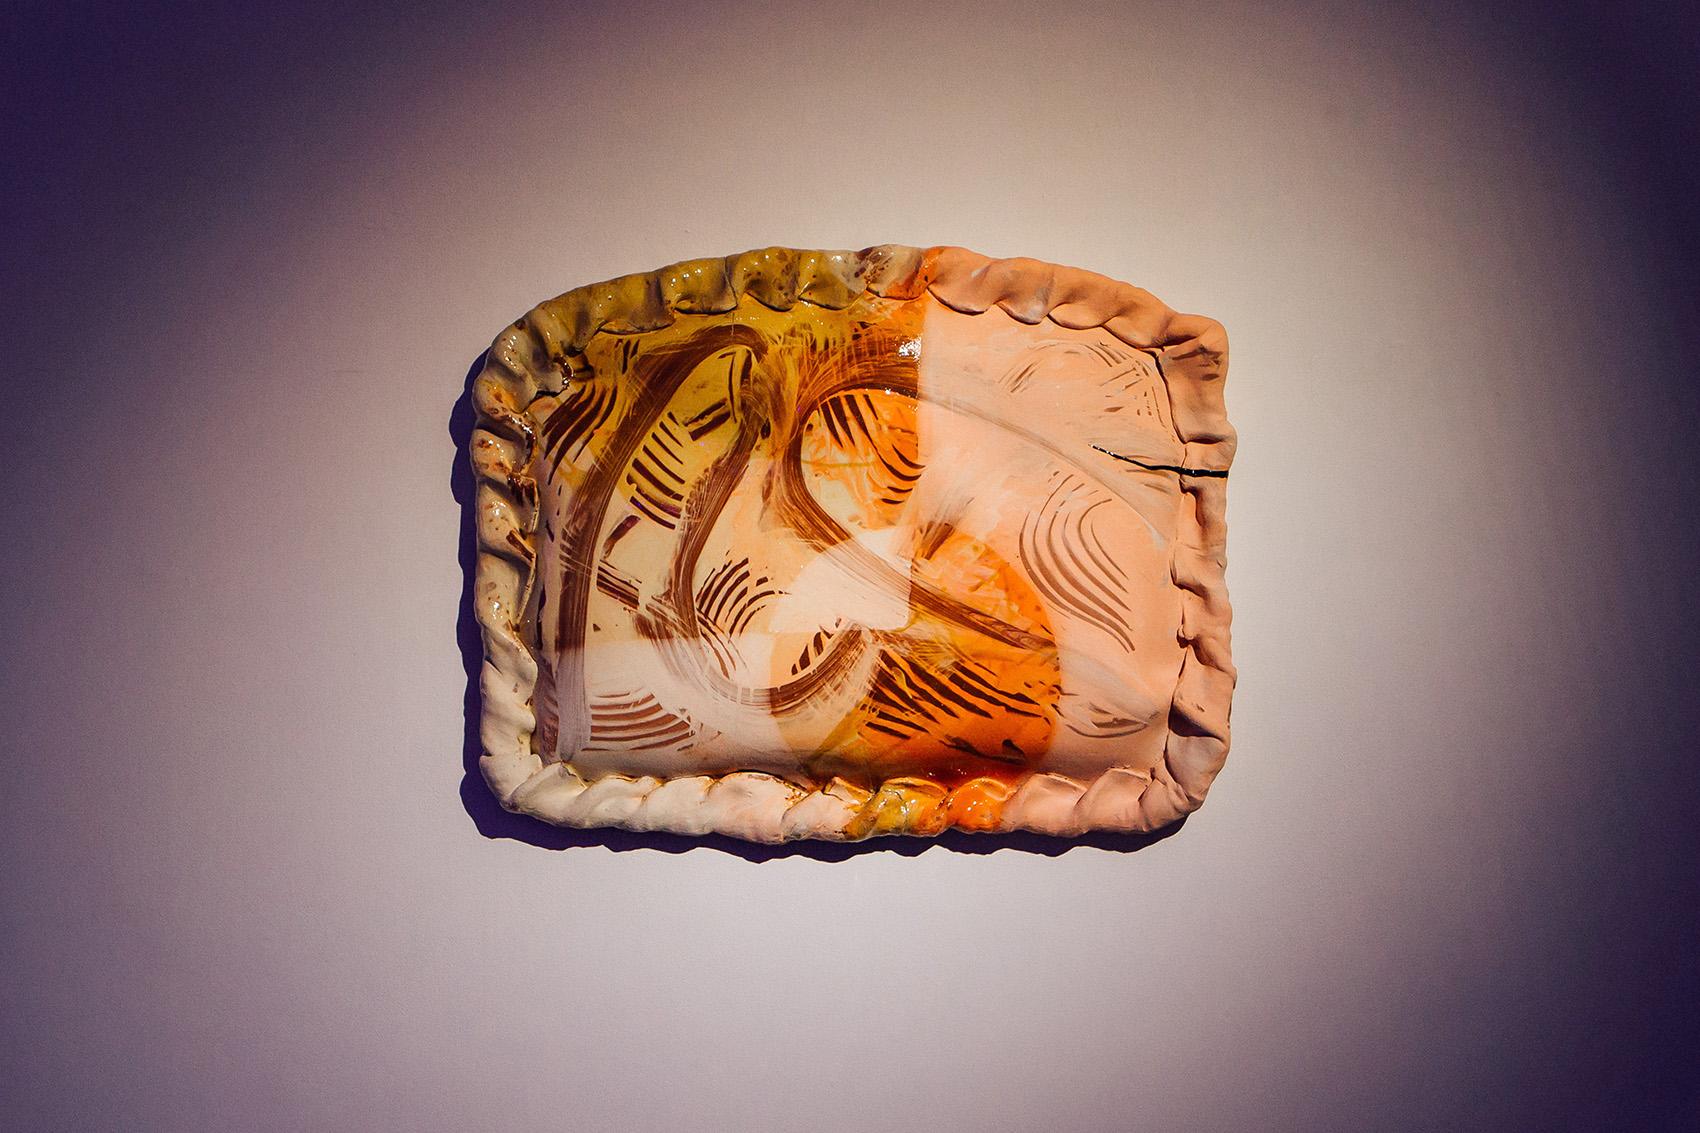 Untitled (XL metaphysical pasty) , 2018, slab-built terracotta, slips, transparent & honey glaze, black kintsugi repair, assistance from Ben Kew